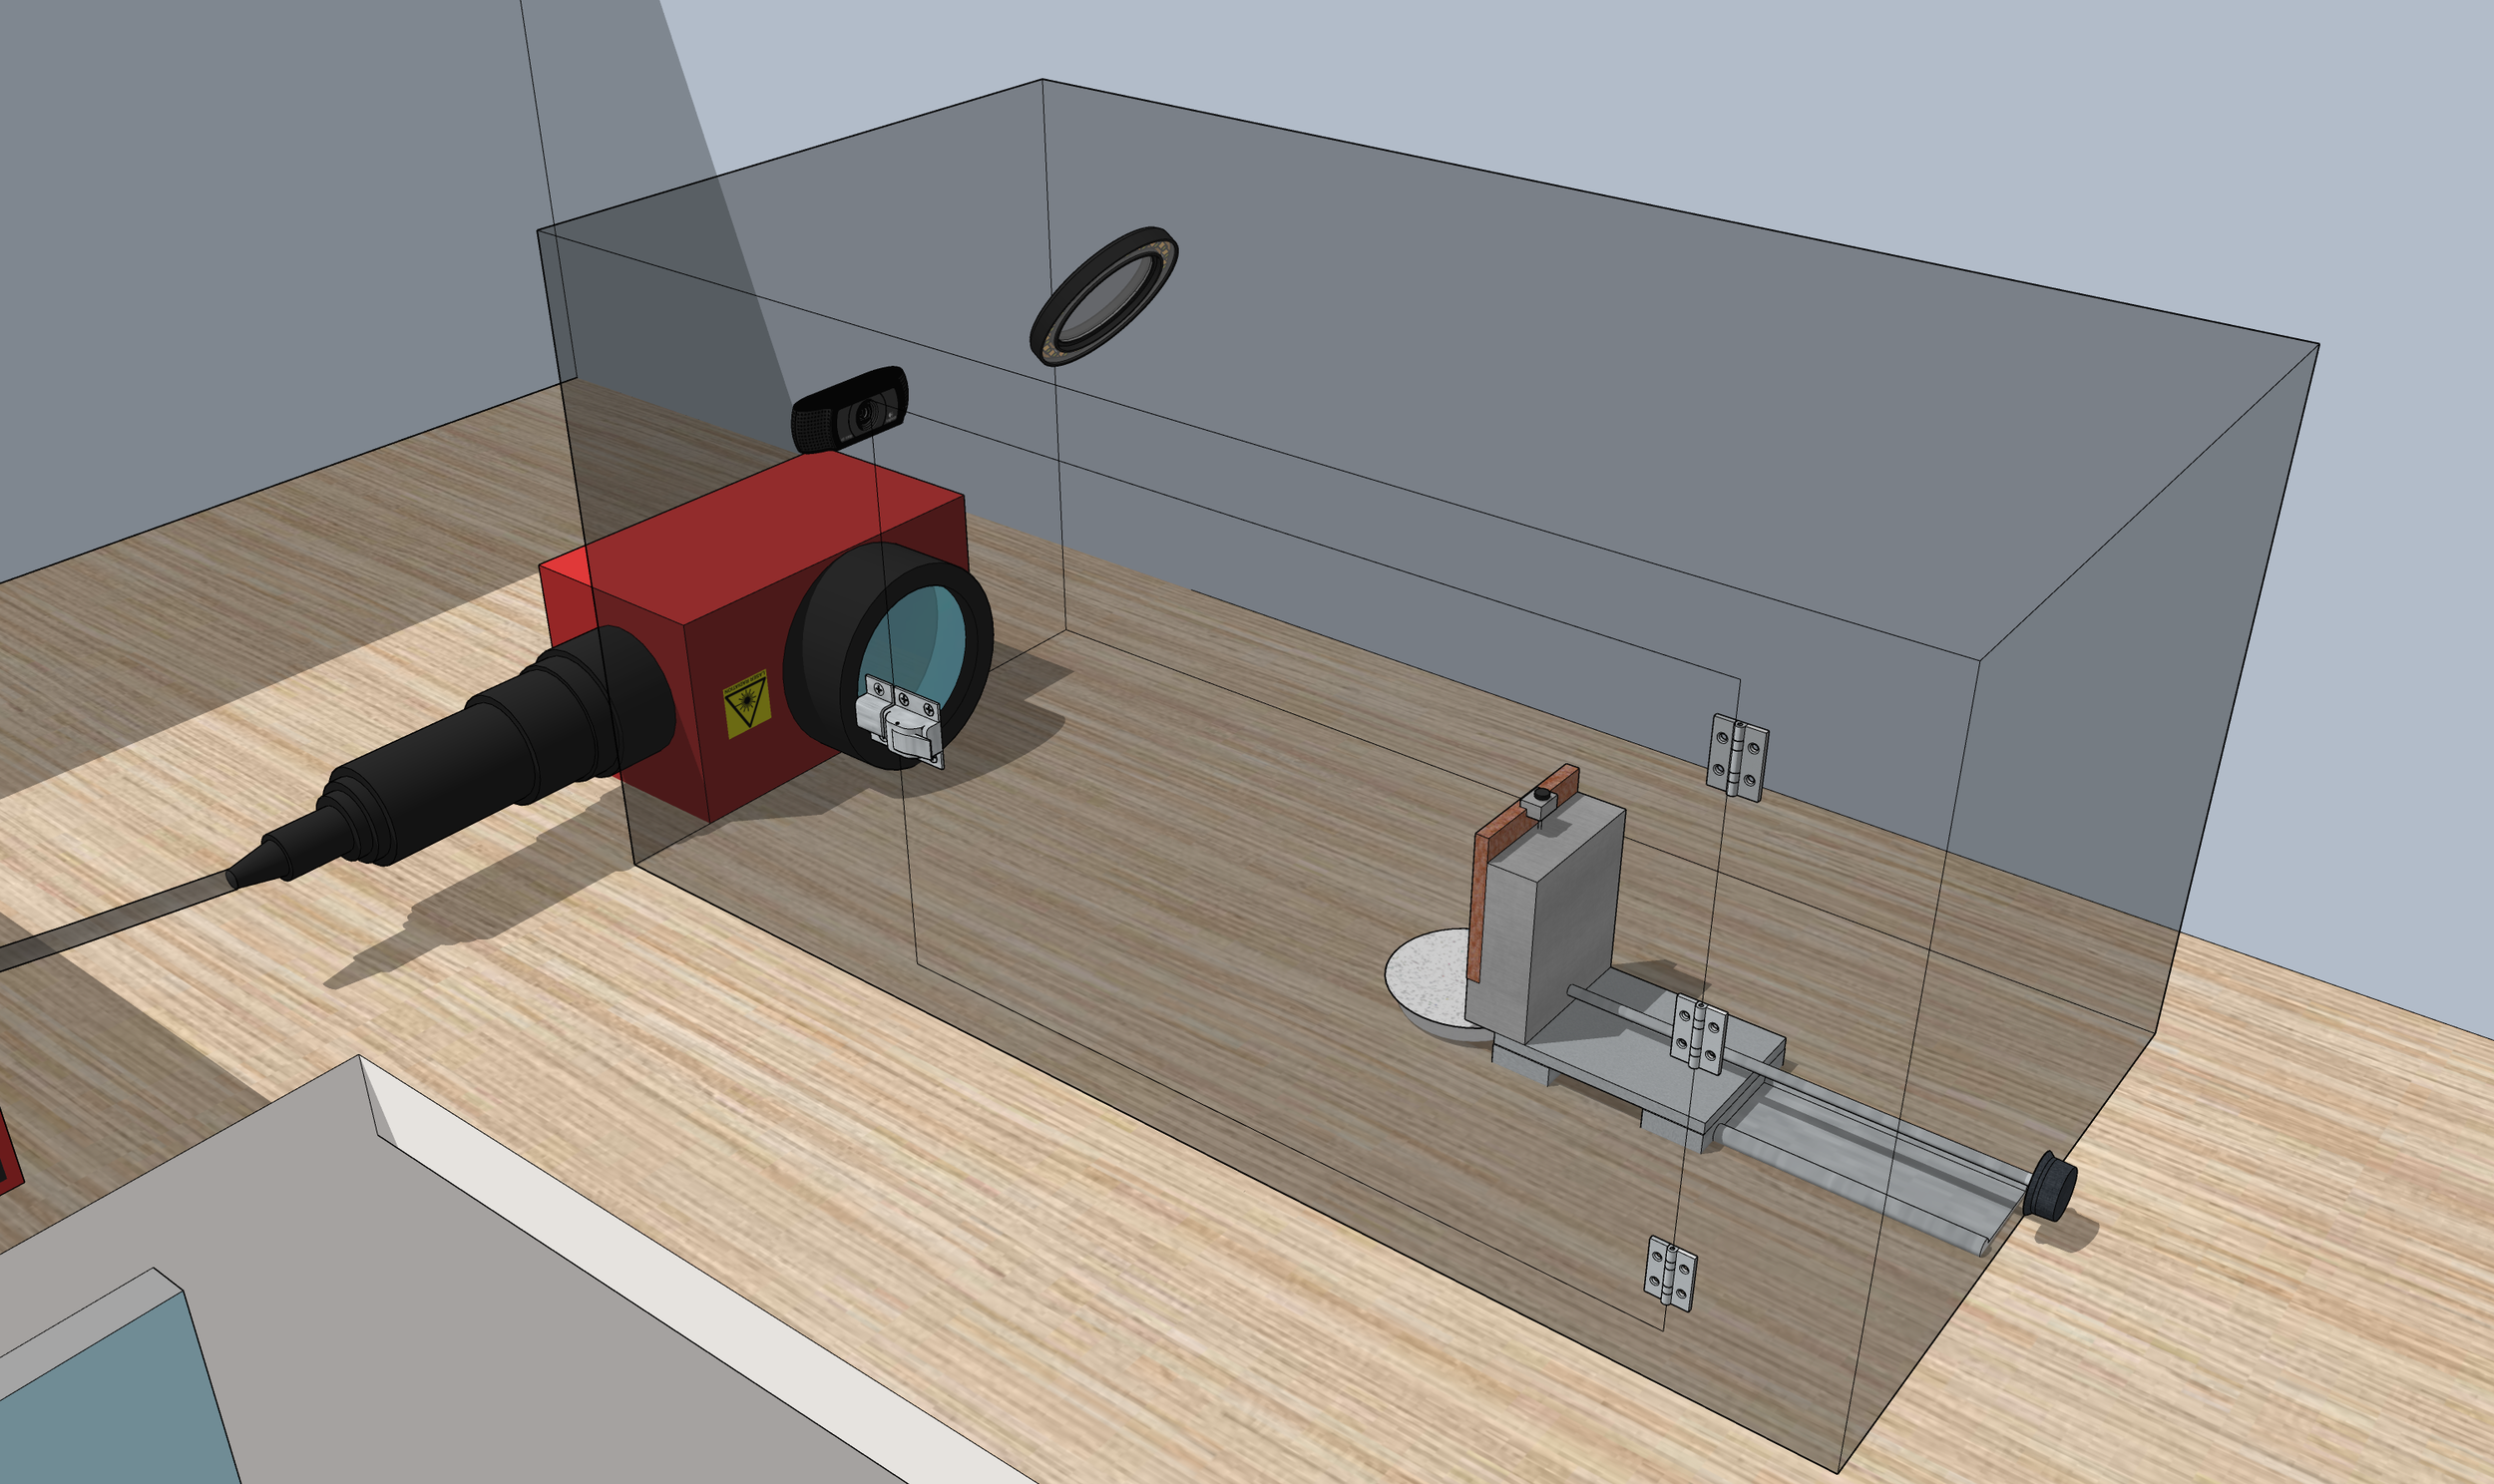 Conceptual design for a laser ablation set-up